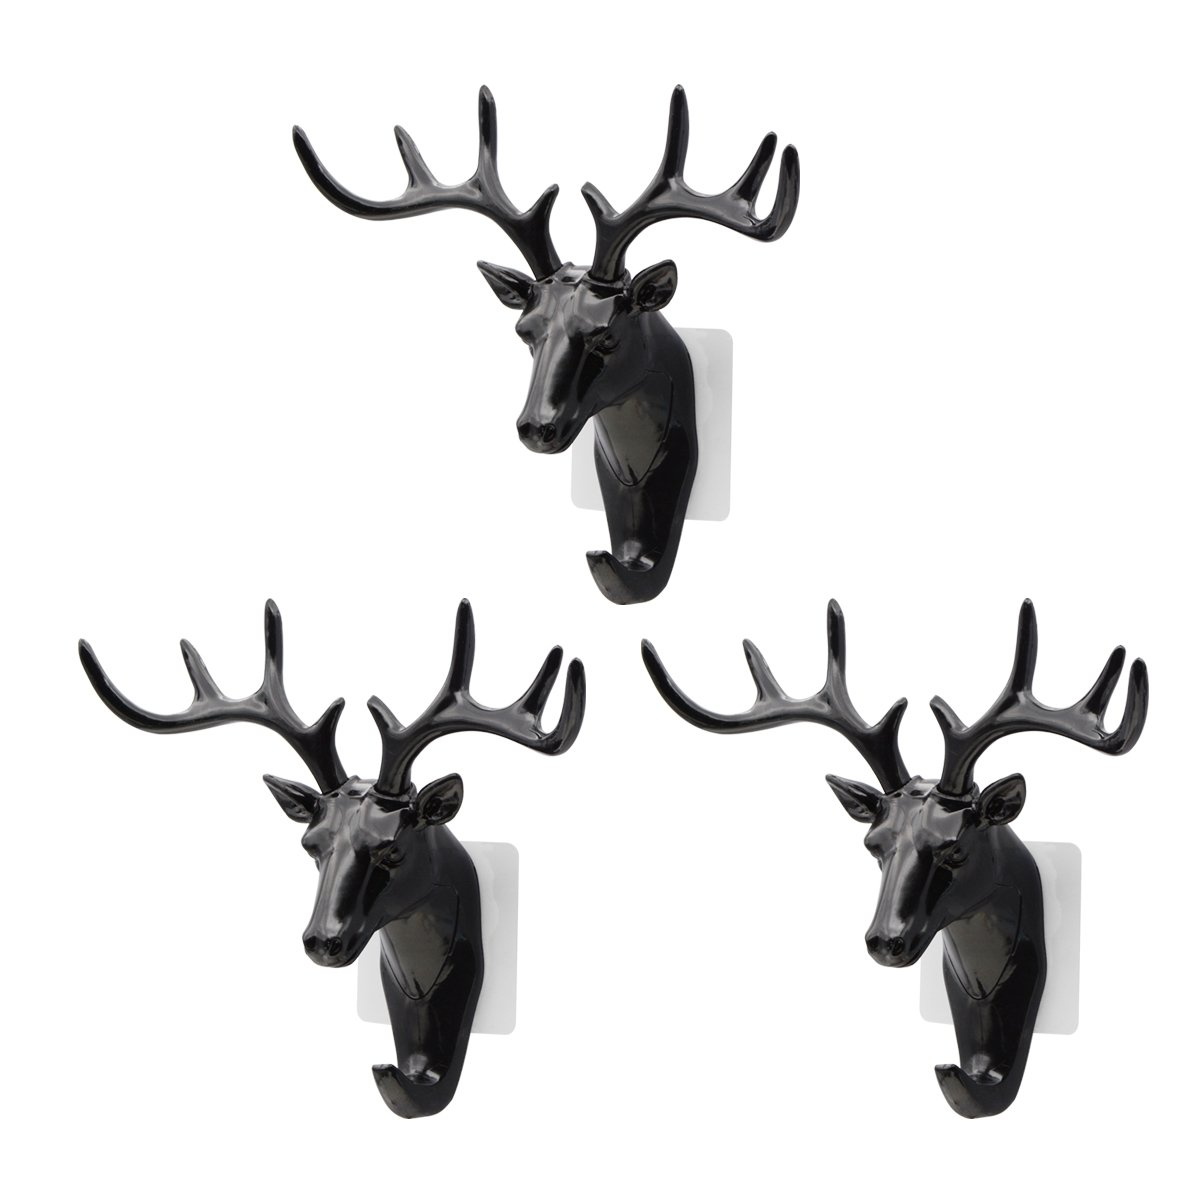 Saim Creative Plastic Hooks Wall Decor Deer Head Animal Self Clothing Jewelry Display Racks Non - Streaking Coat Cap Bag Keys Hanger Hook, Black, 3Pcs